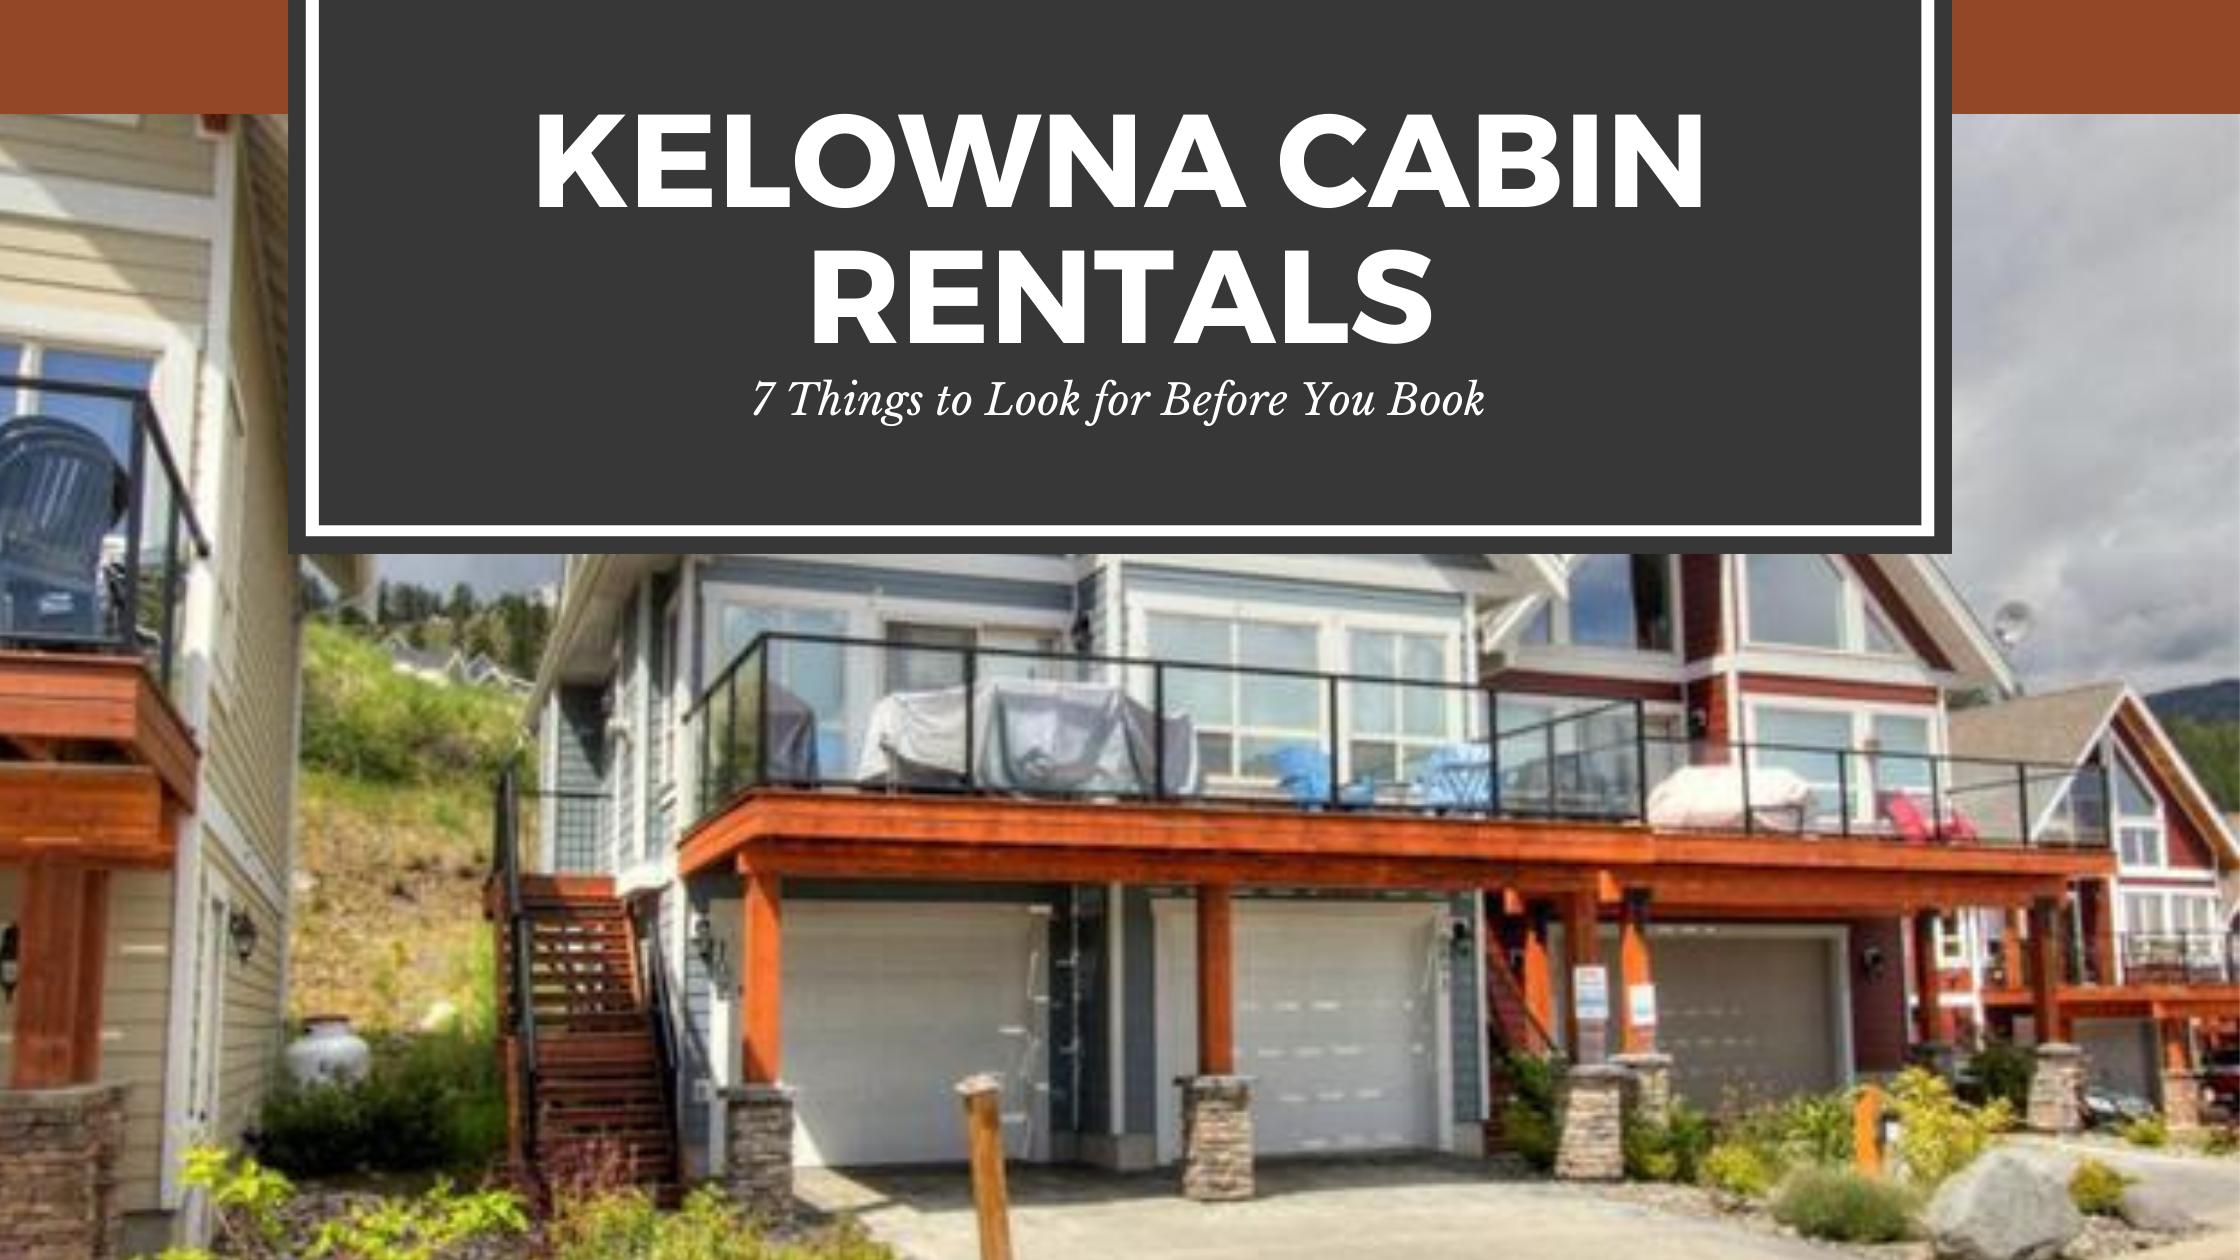 Kelowna Cabin Rentals